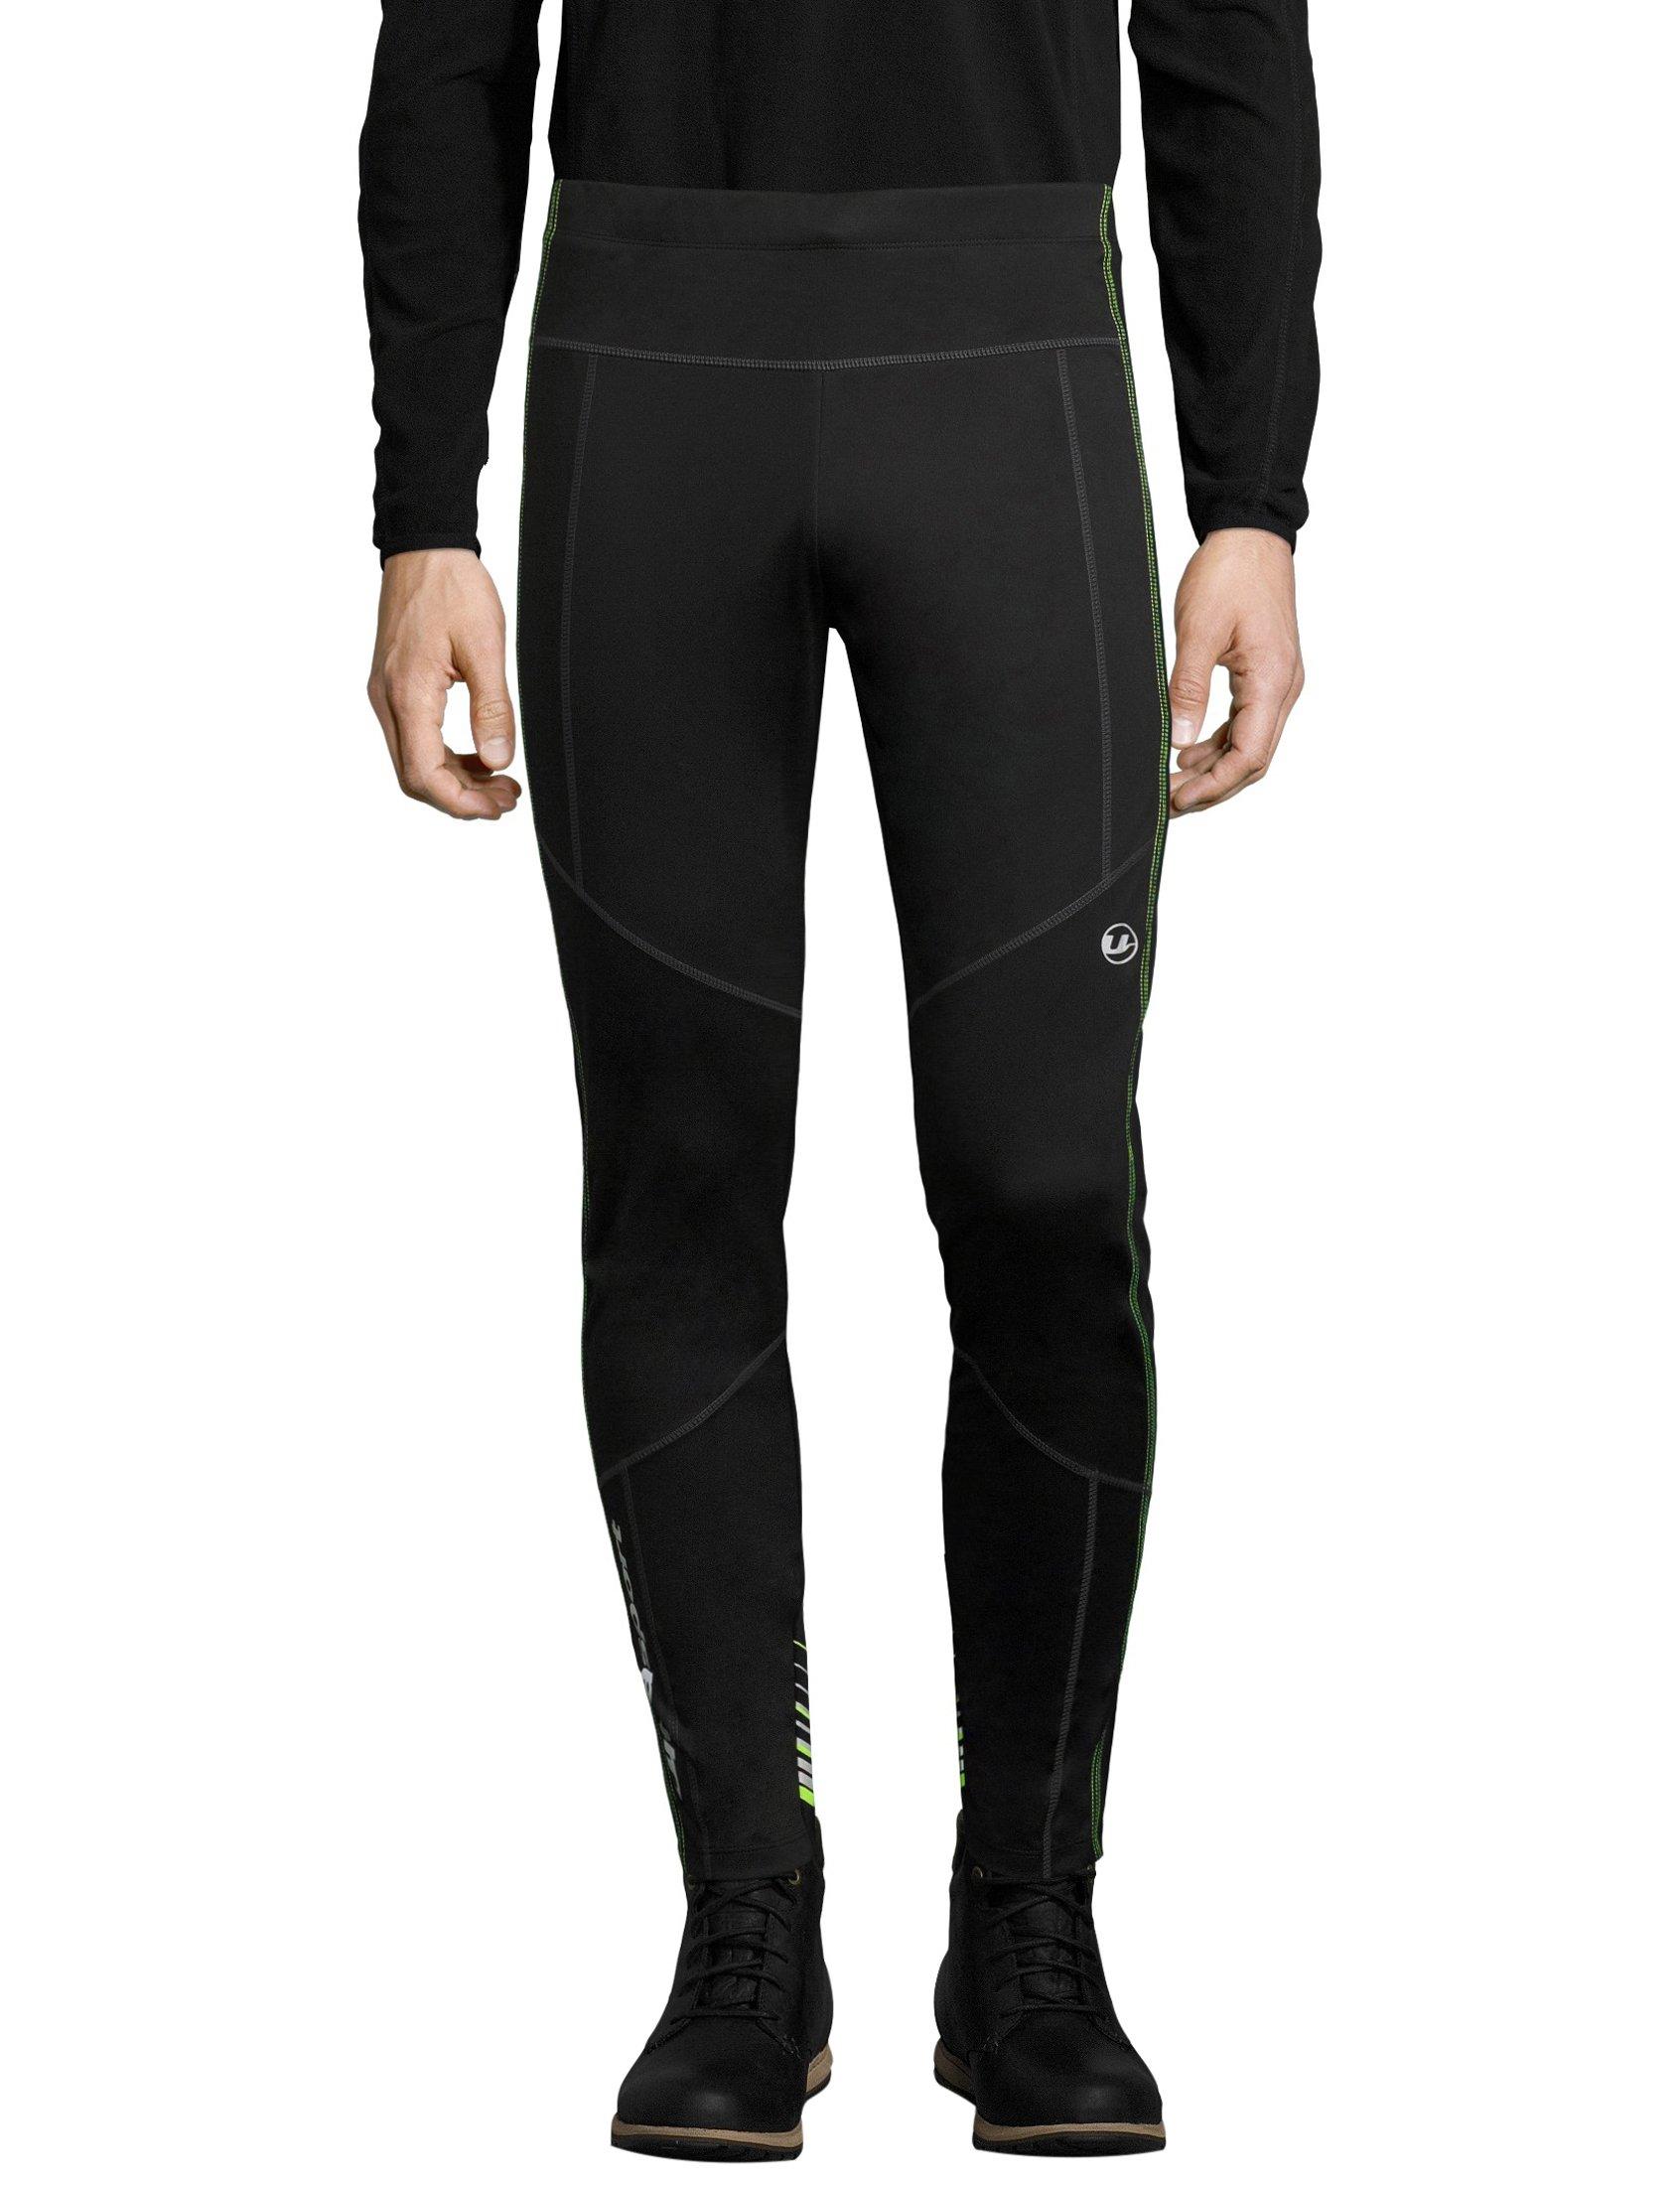 Ultrasport Advanced Avers Pantalon de Ski de Fond Homme product image